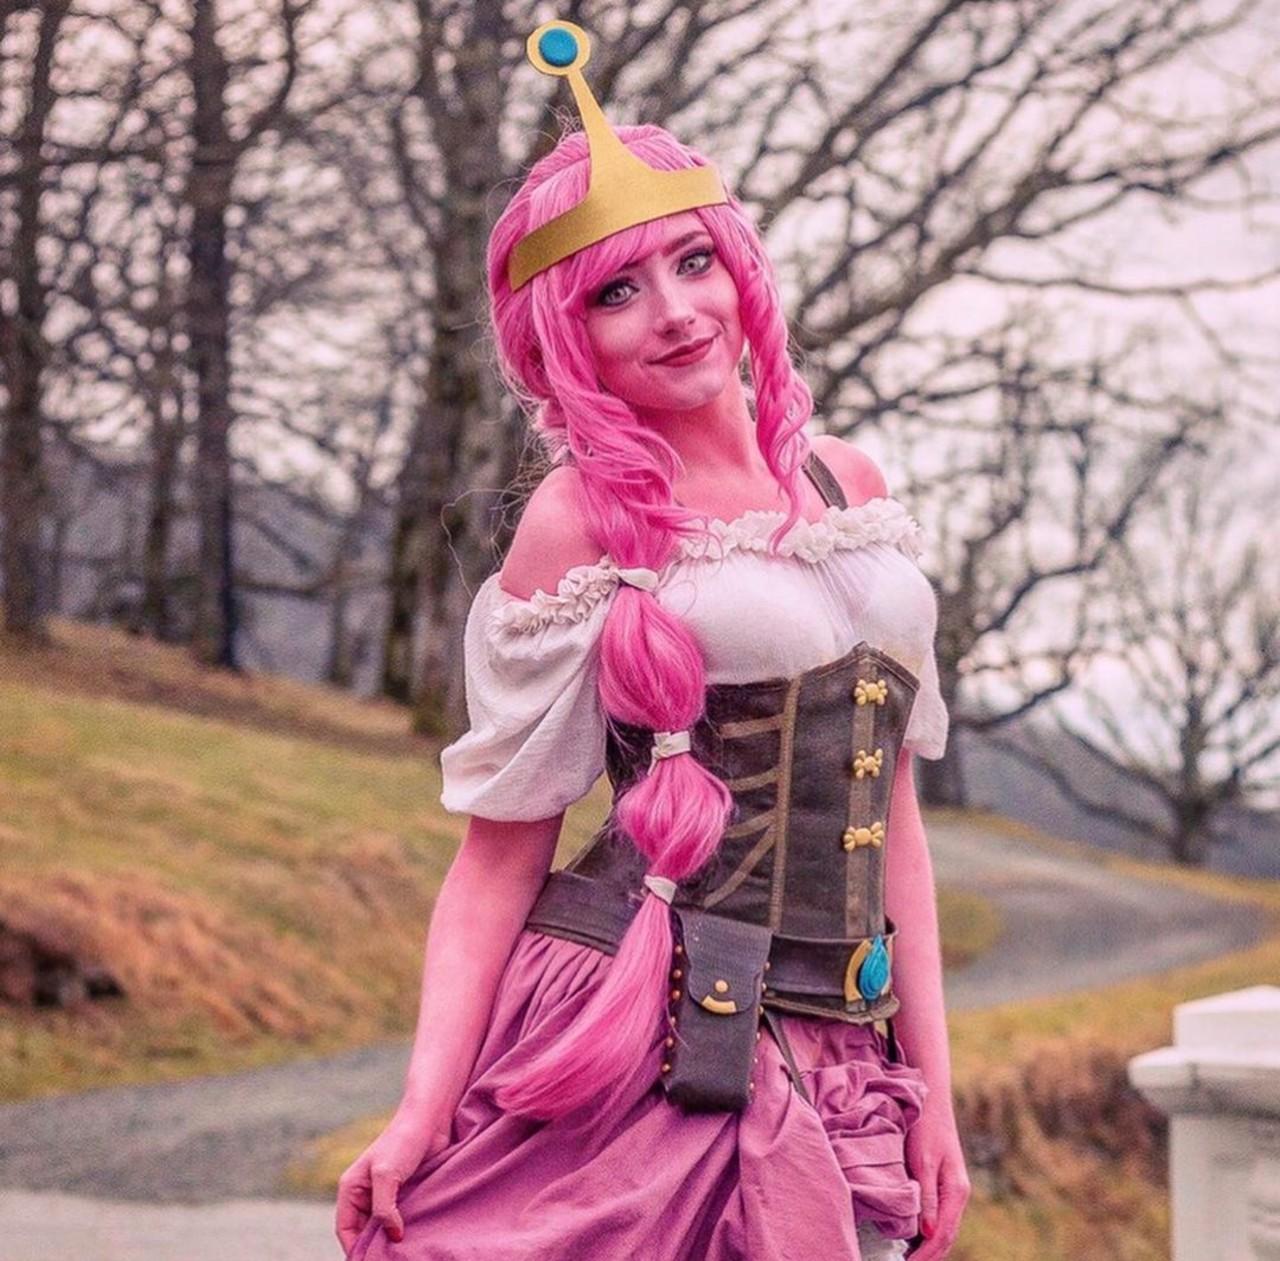 Hora de Aventura: Chica recrea a Dulce Princesa con un interesante estilo steampunk